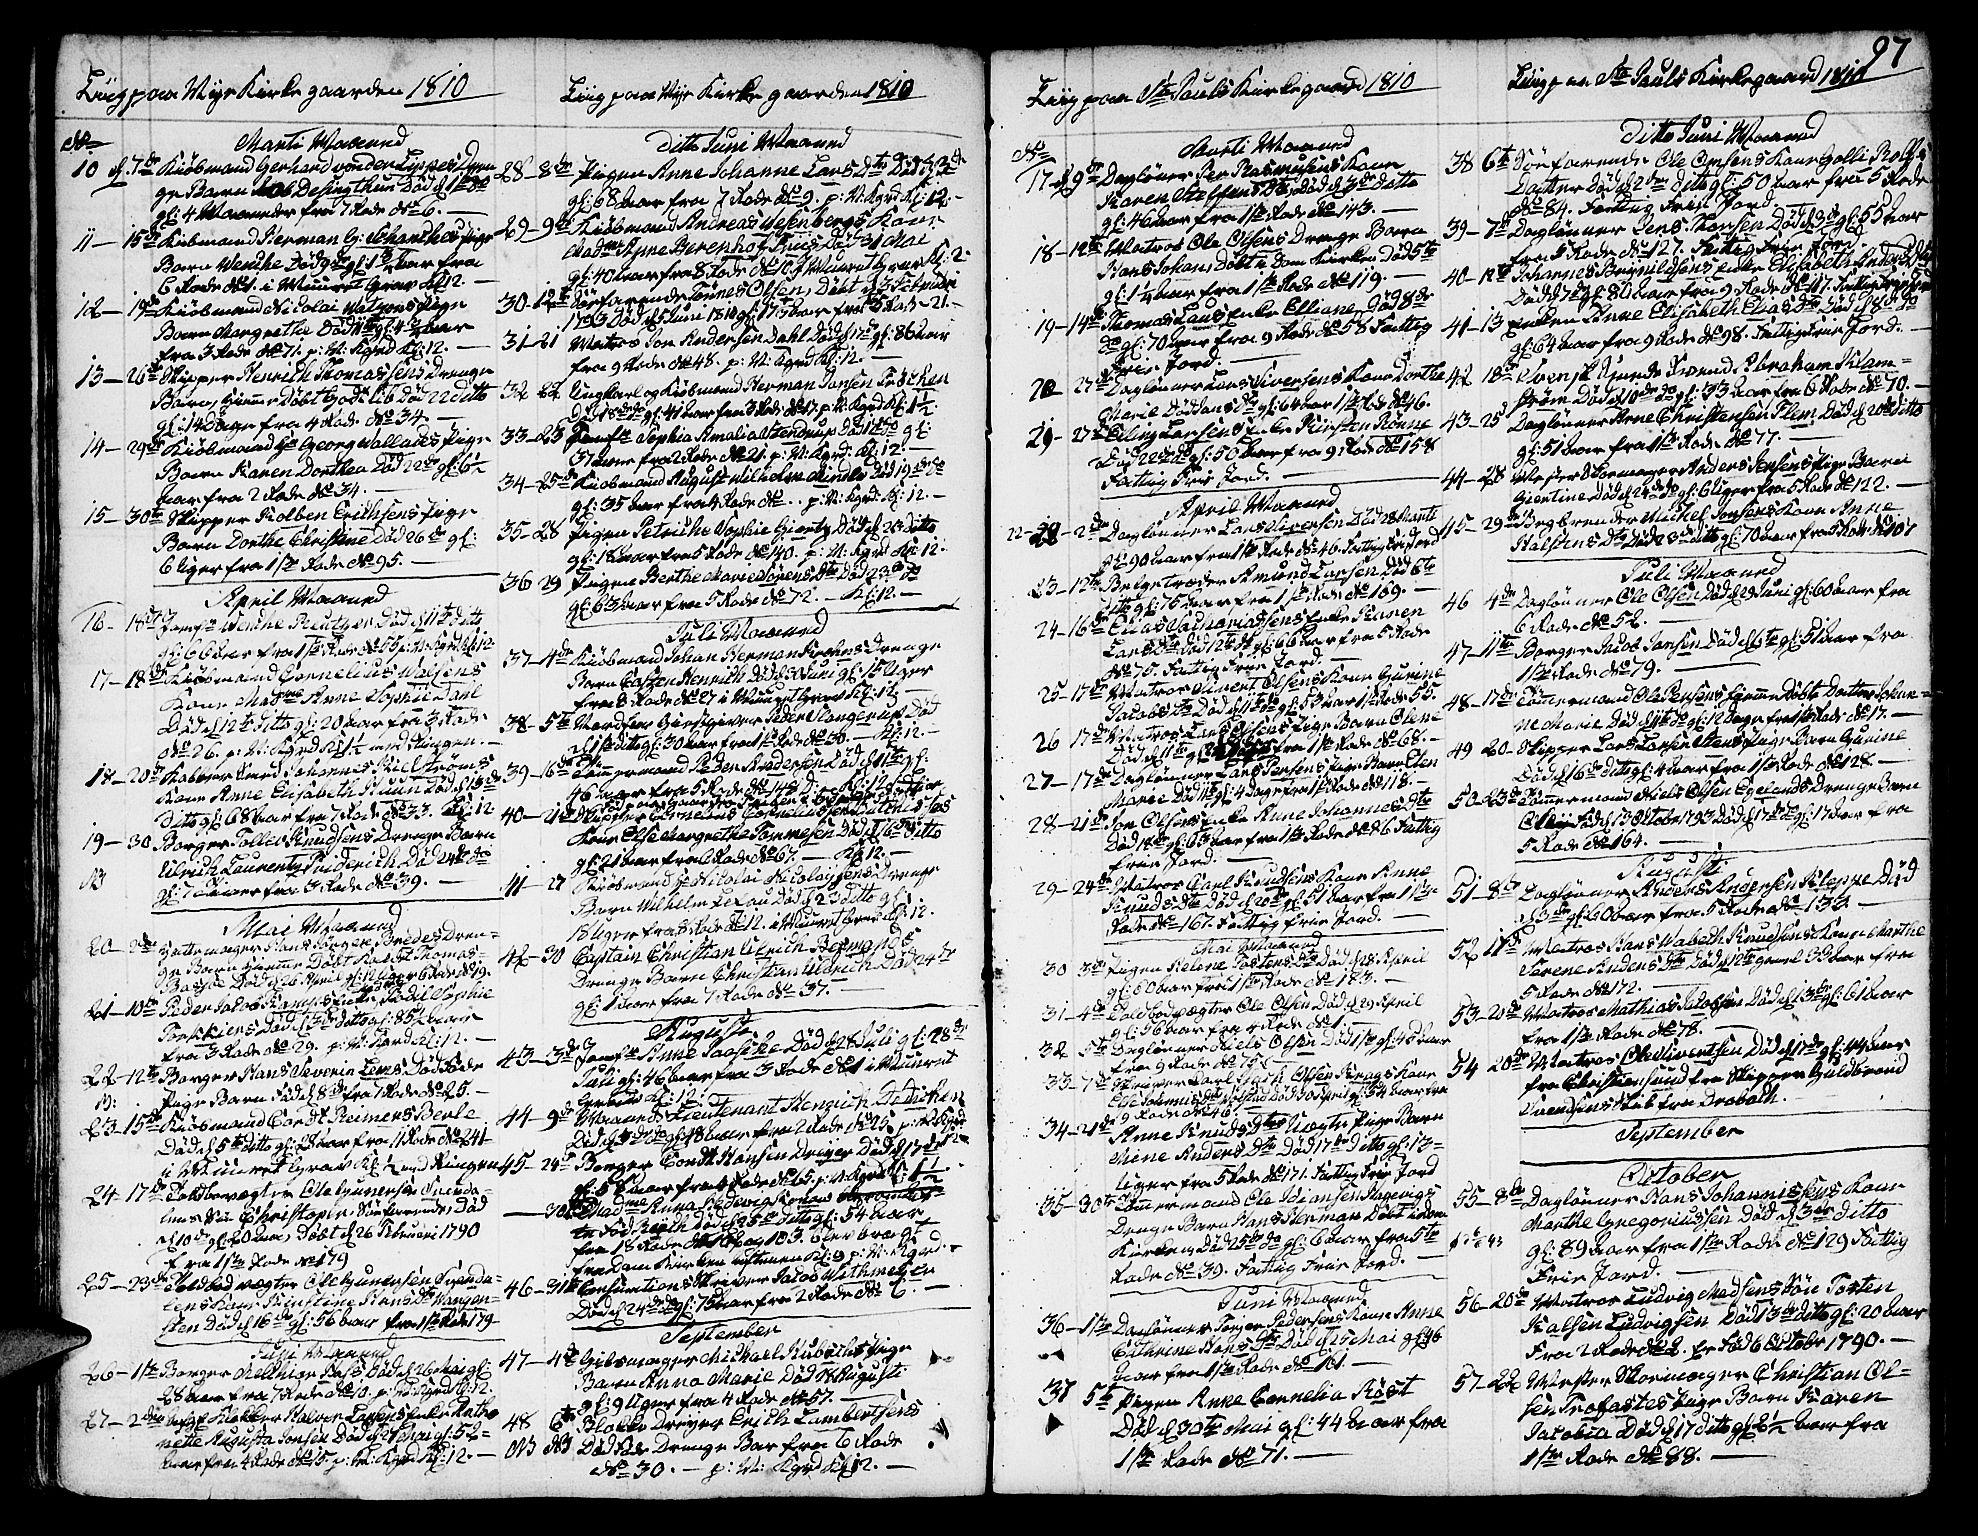 SAB, Nykirken Sokneprestembete, H/Hab: Klokkerbok nr. A 3, 1775-1820, s. 97